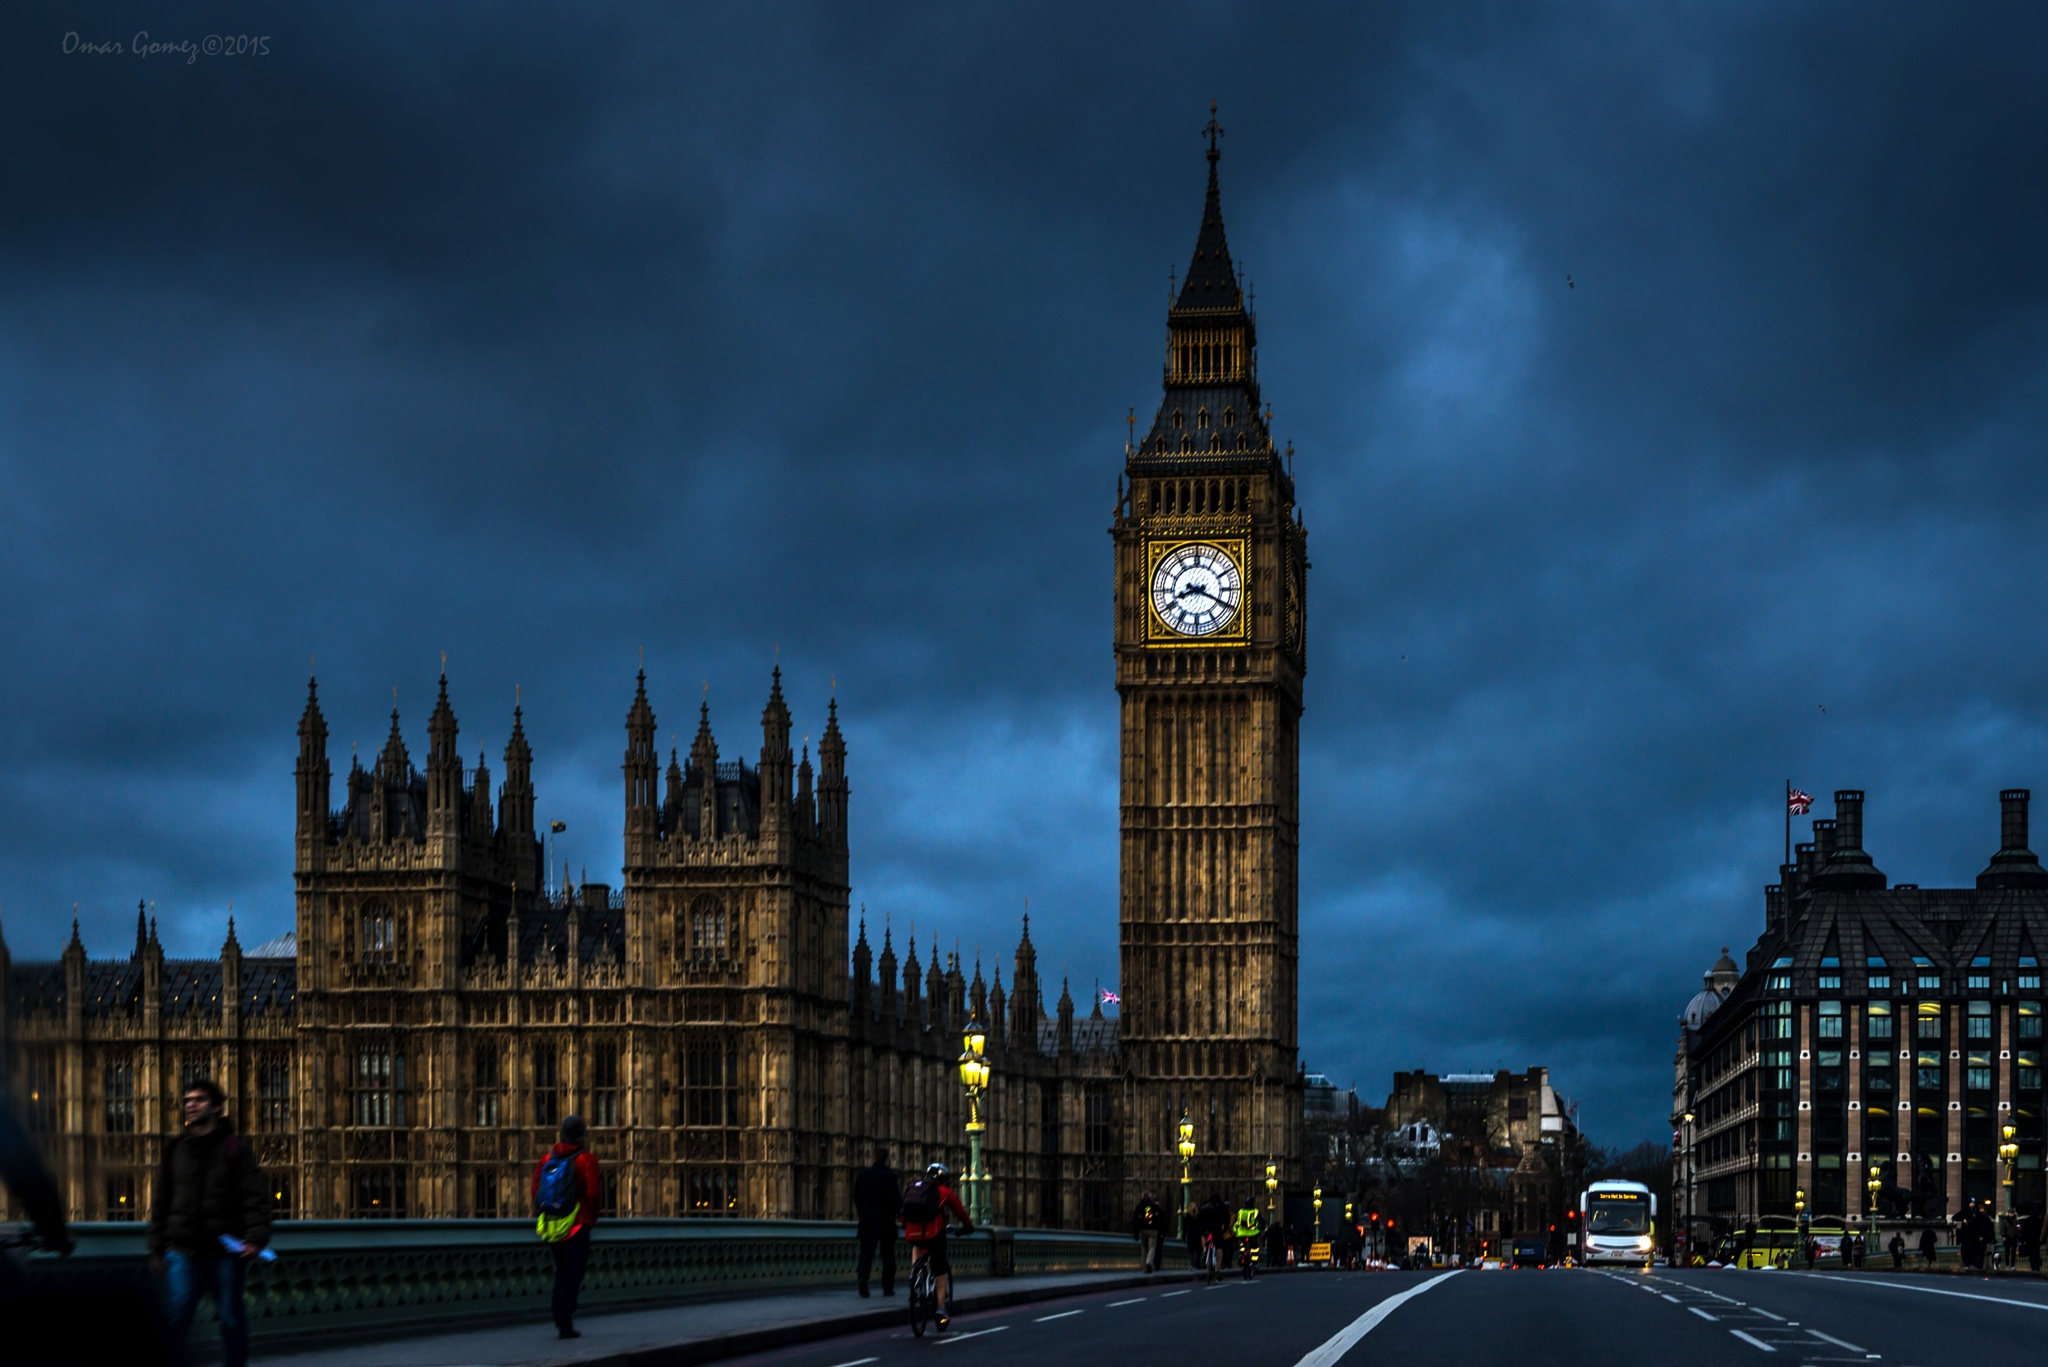 The Big Ben  by Omar Gomez